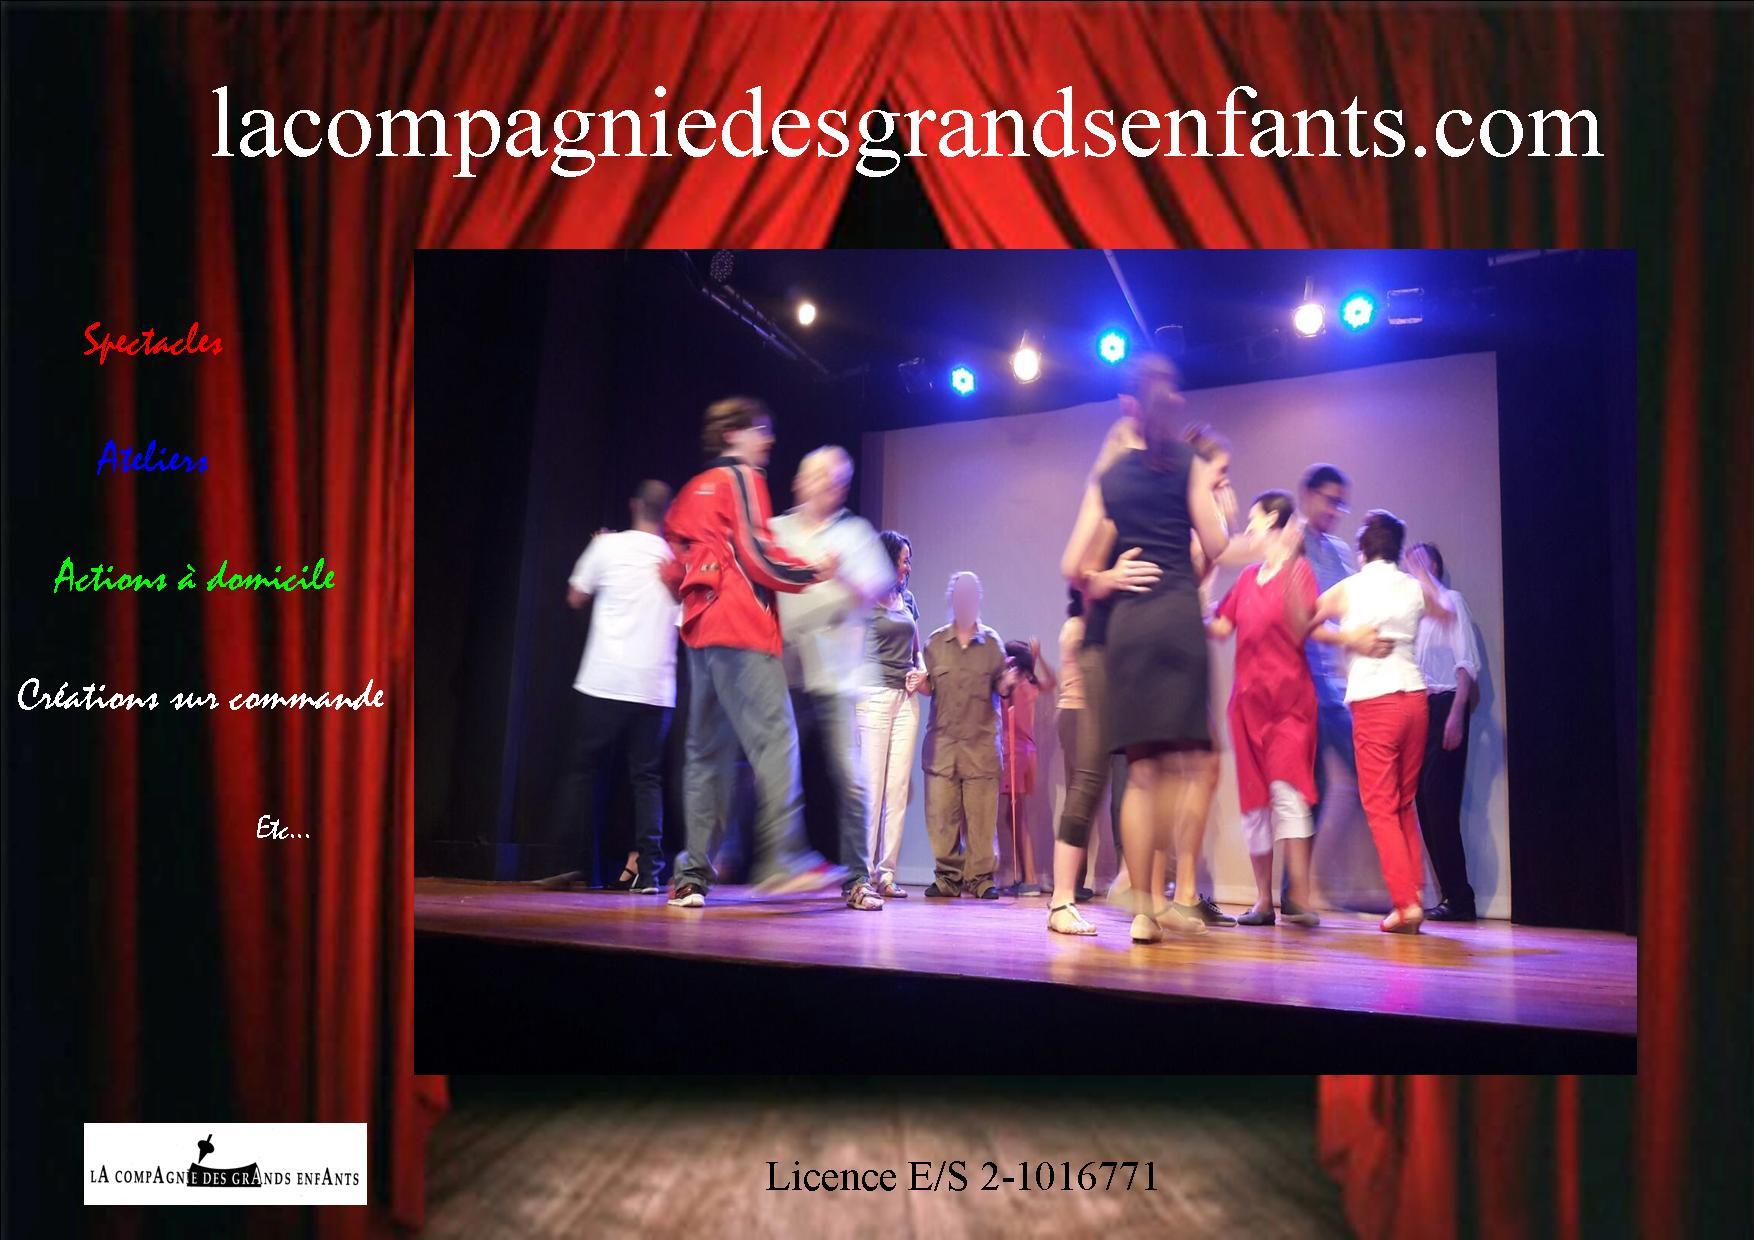 image promo site web2.jpg